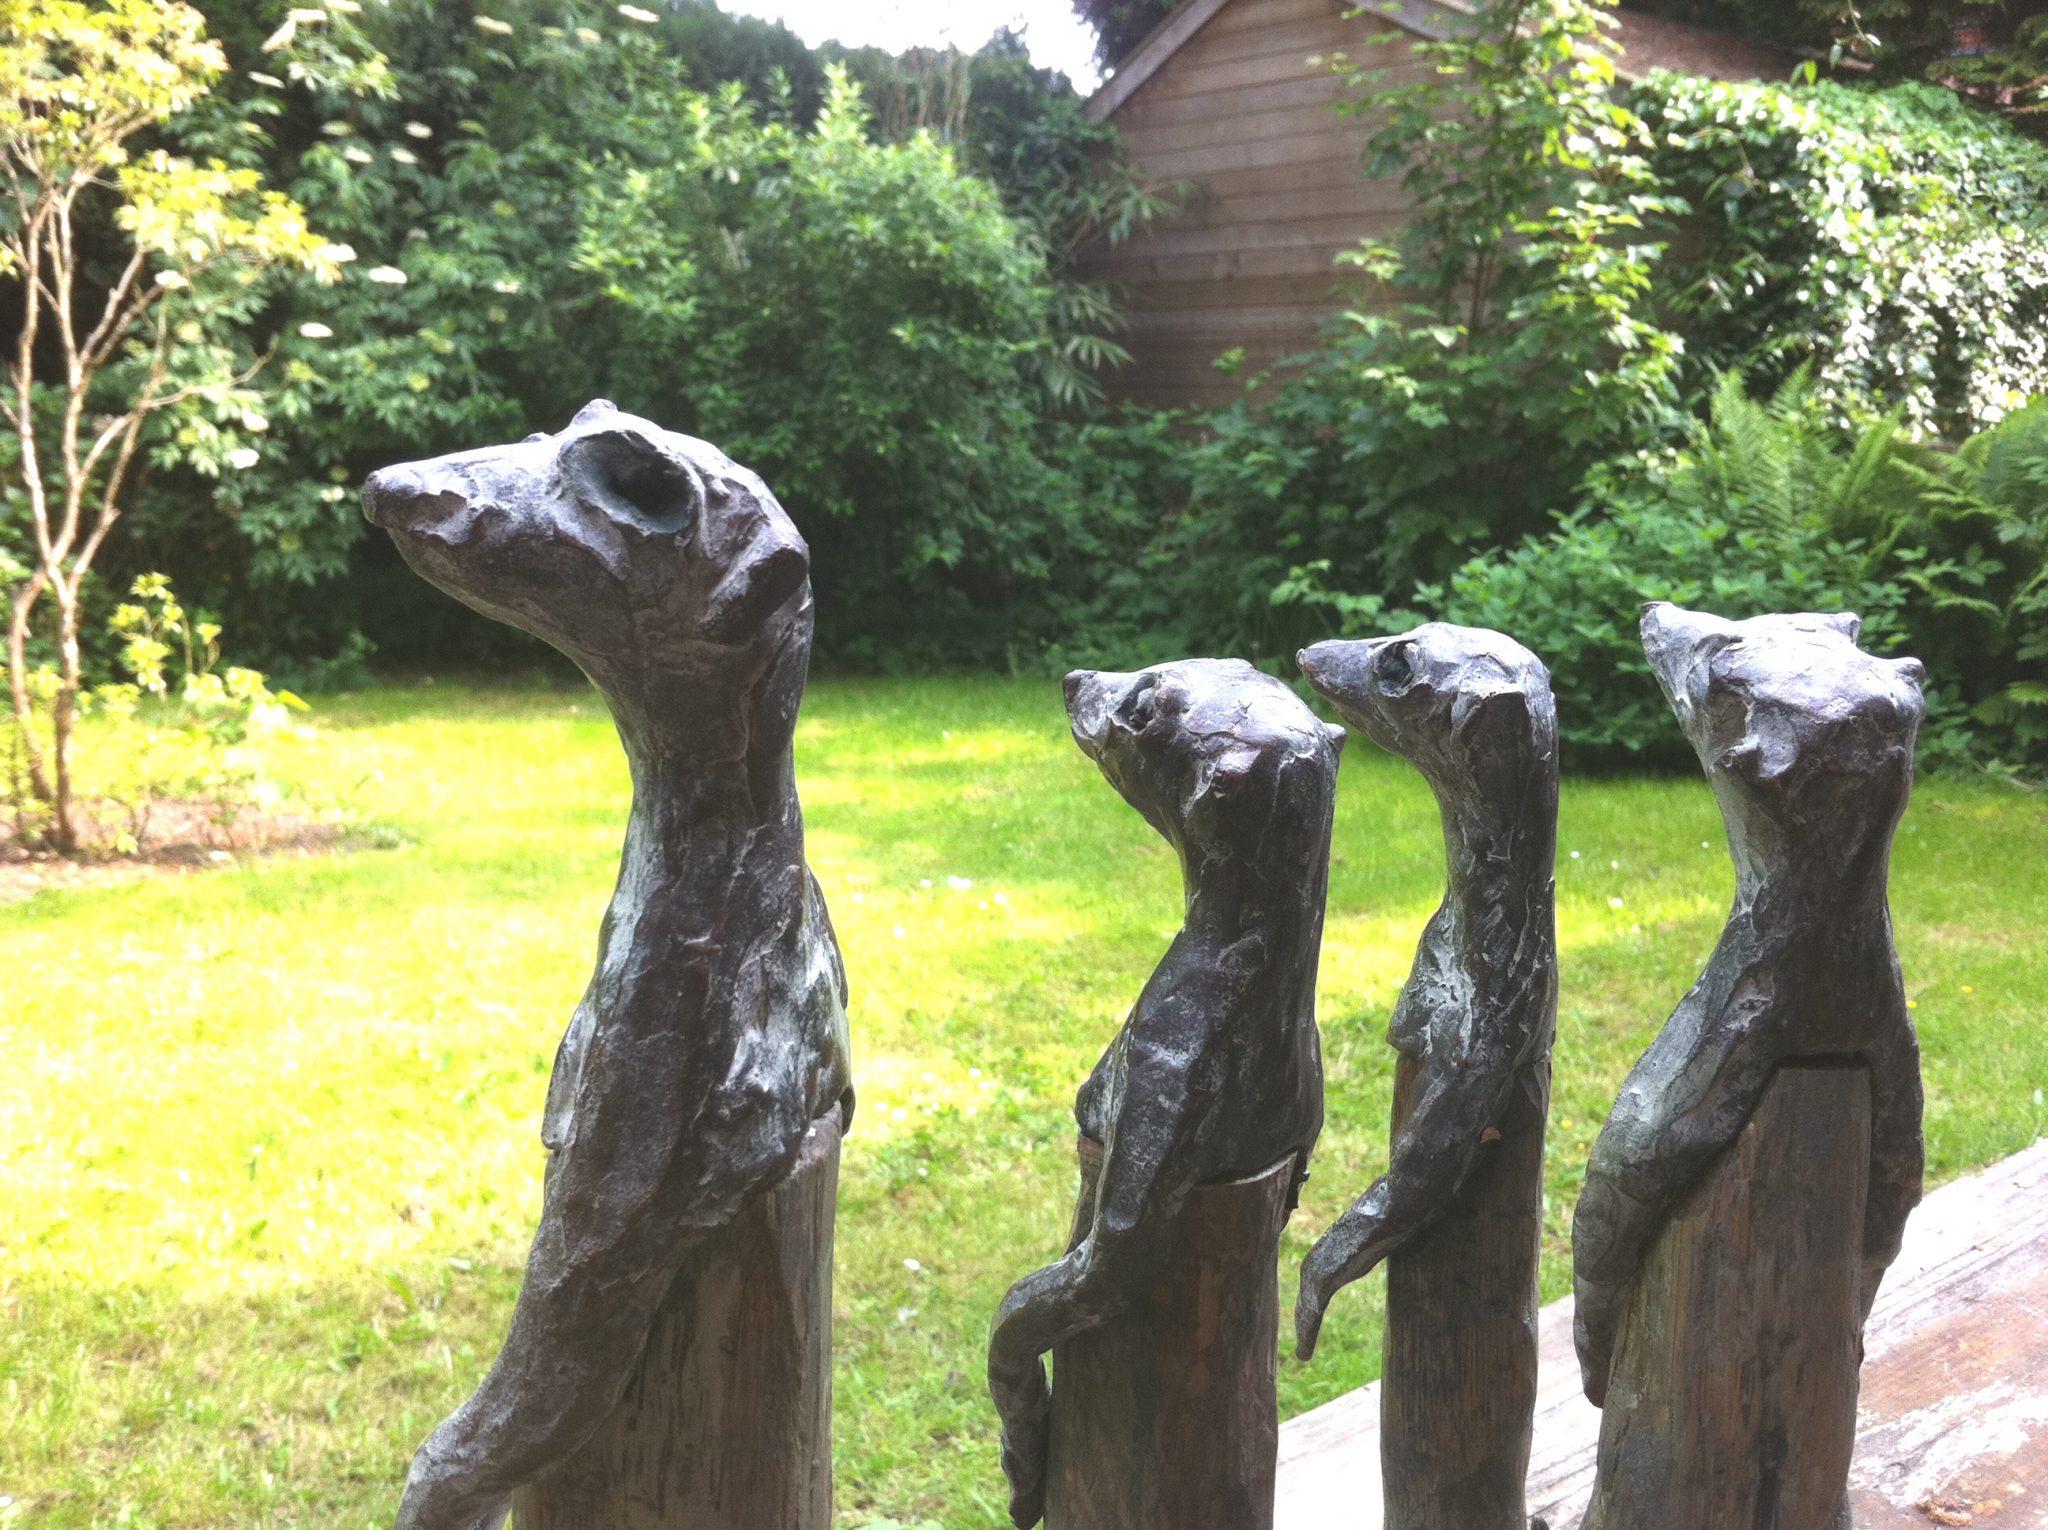 Wachters half - Bronse+Wood